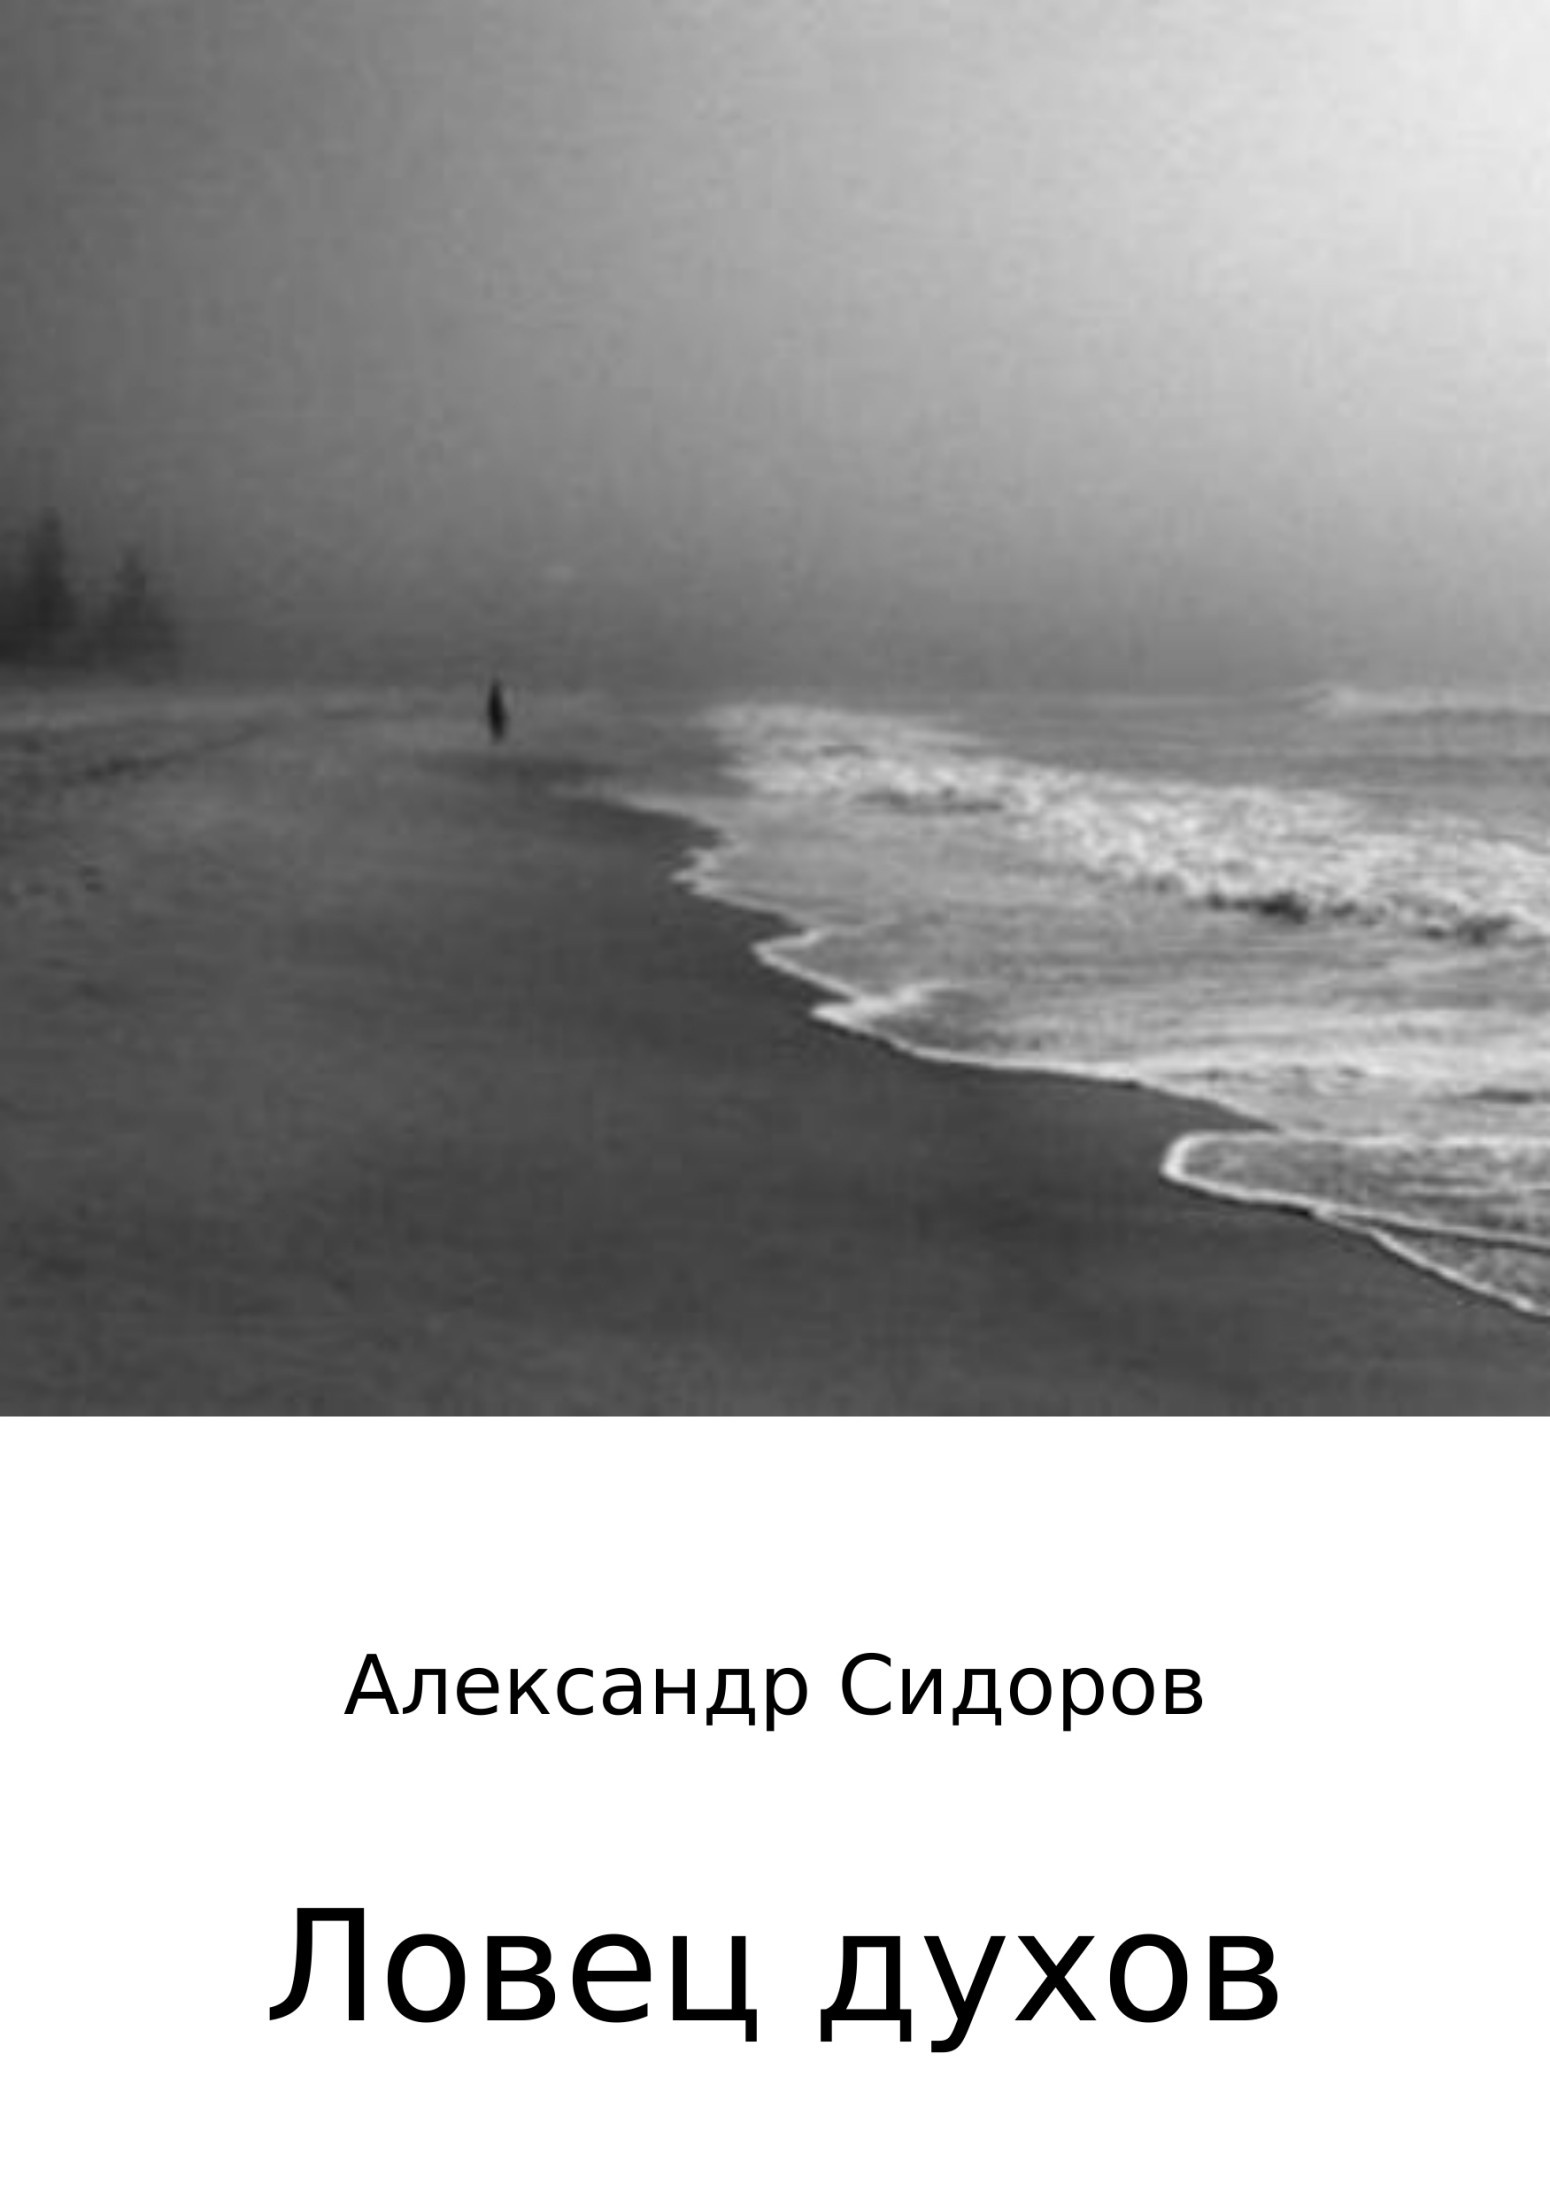 цена на Александр Владимирович Сидоров Ловец духов